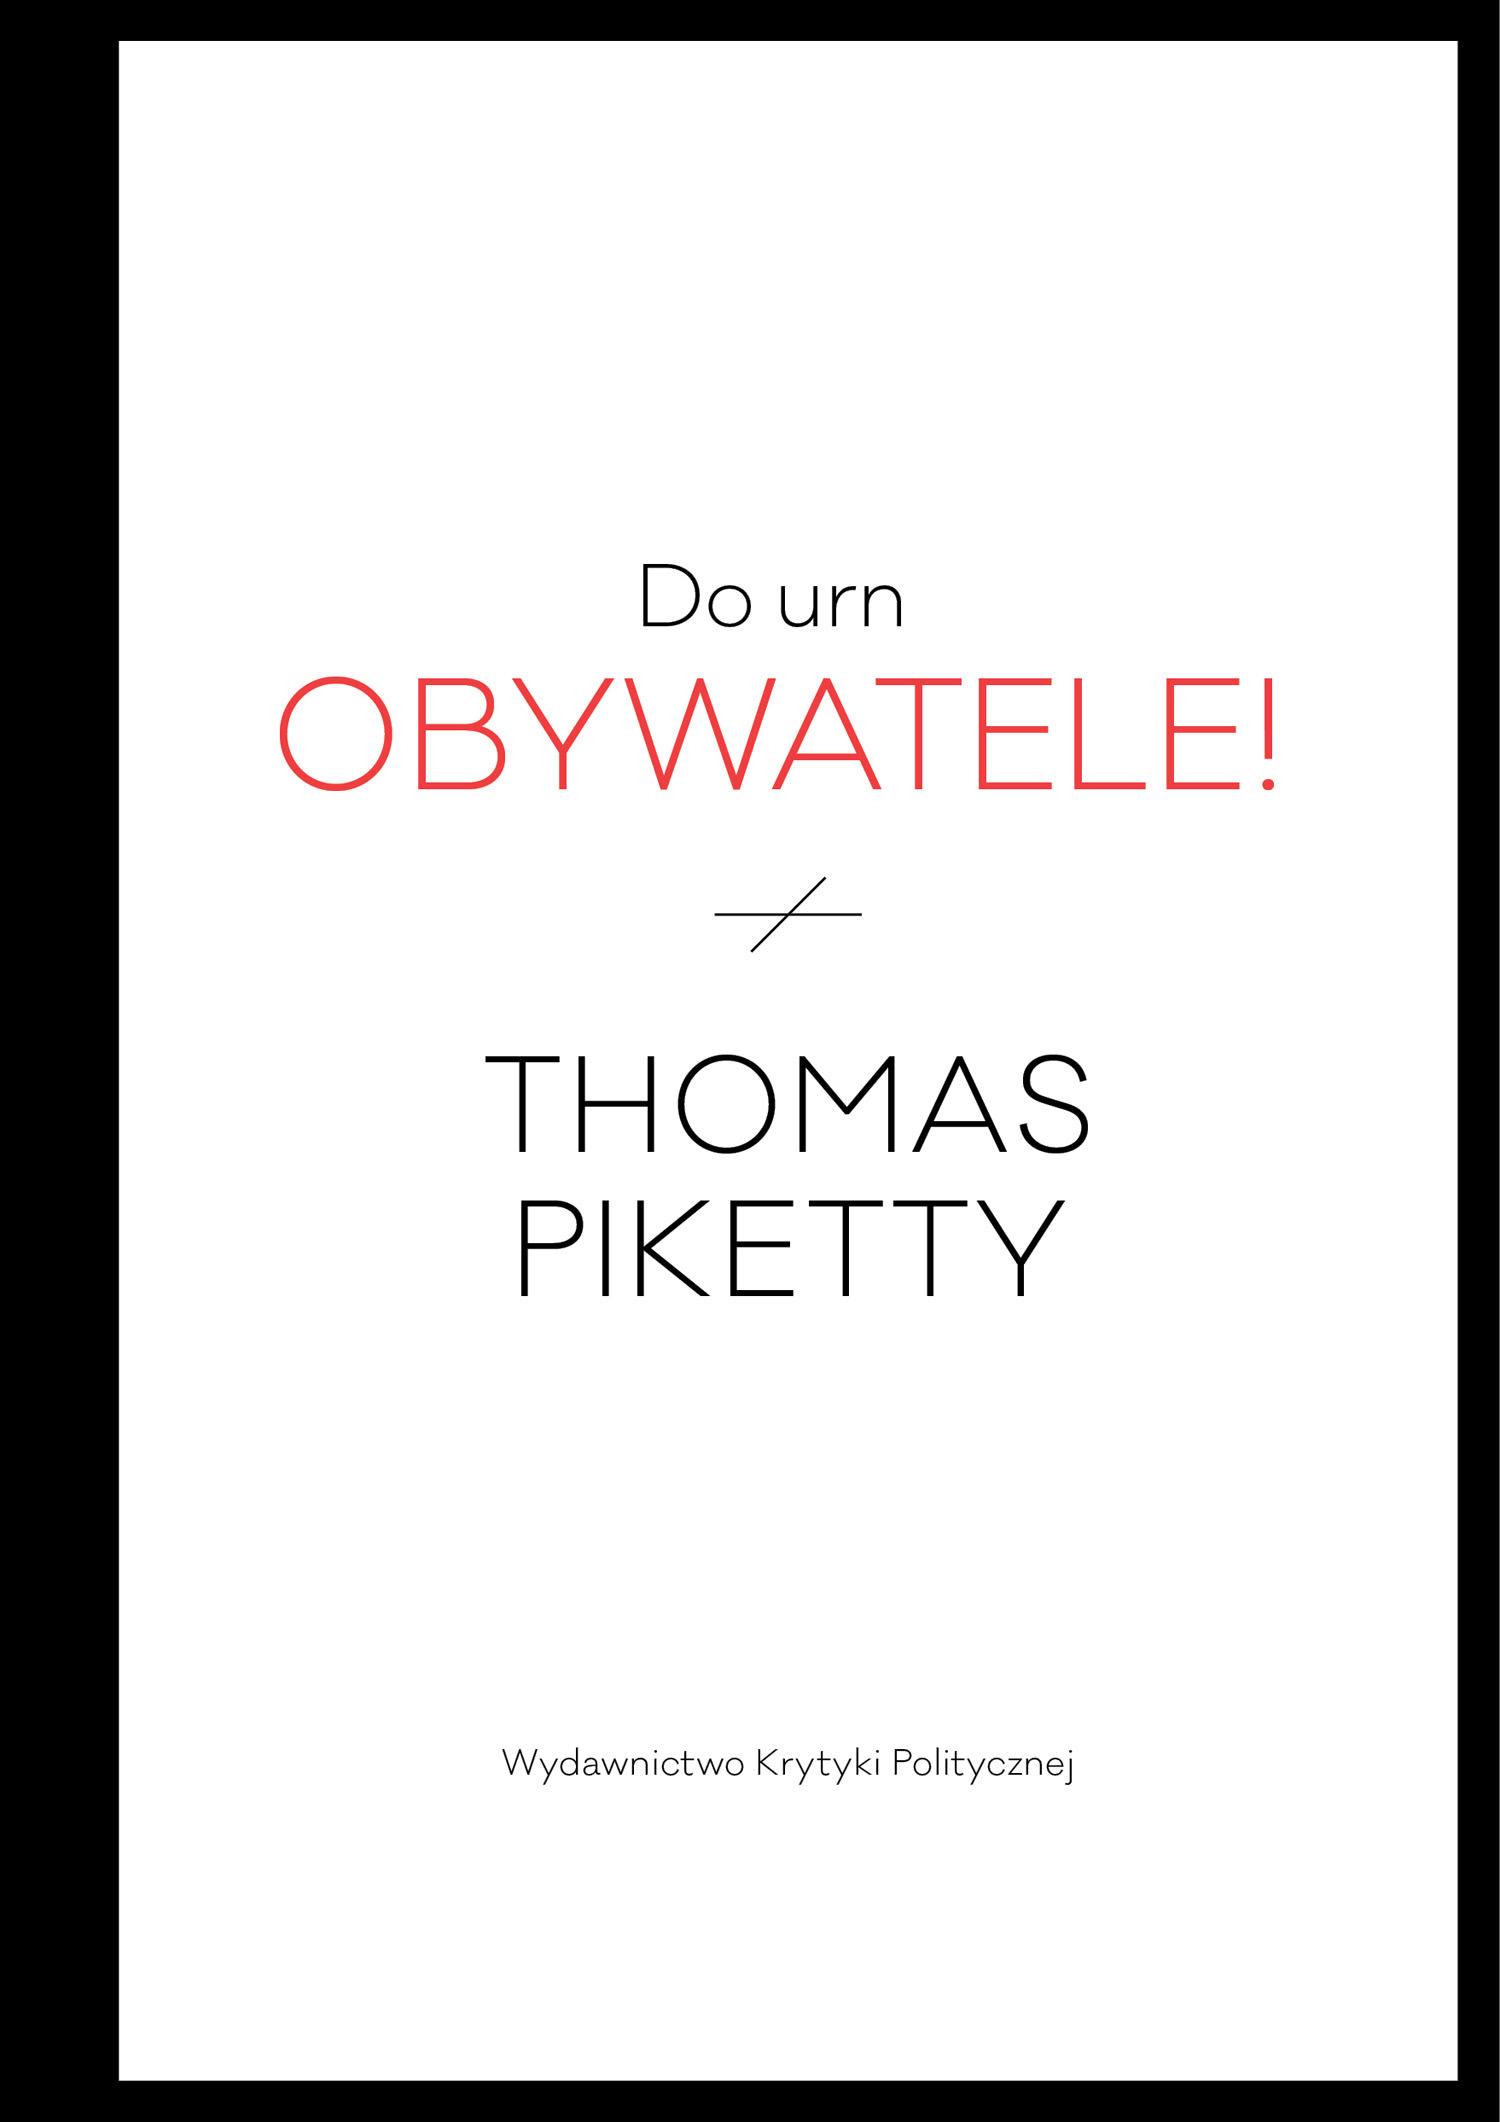 Thomas Piketty: Do urn, obywatele!